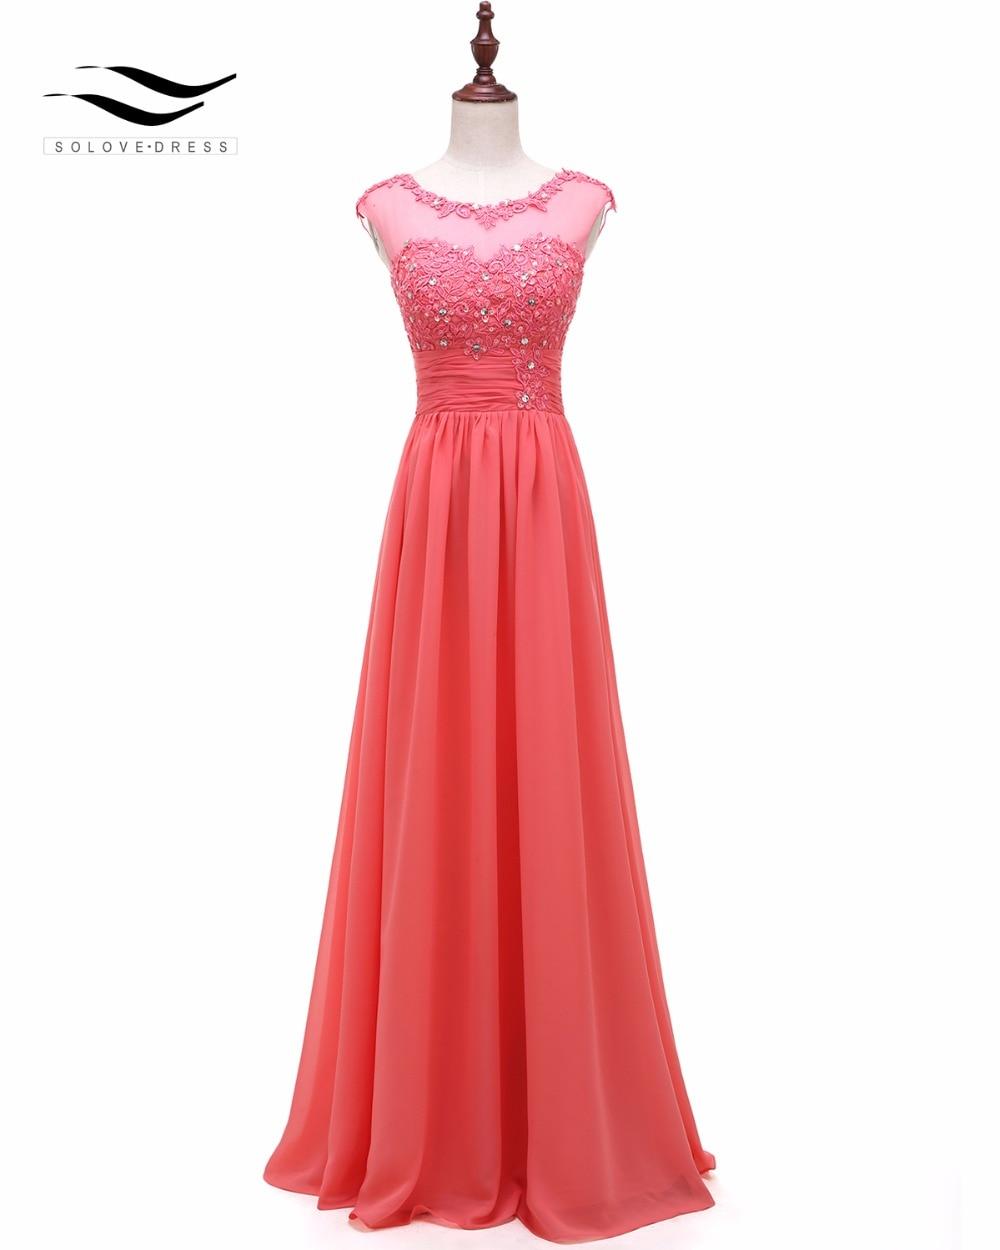 Solovedress Appliques Real Photos Cap Sleeves Beaded A Line Bridesmaid Dress Pleat Gown Elegant Vestidos De